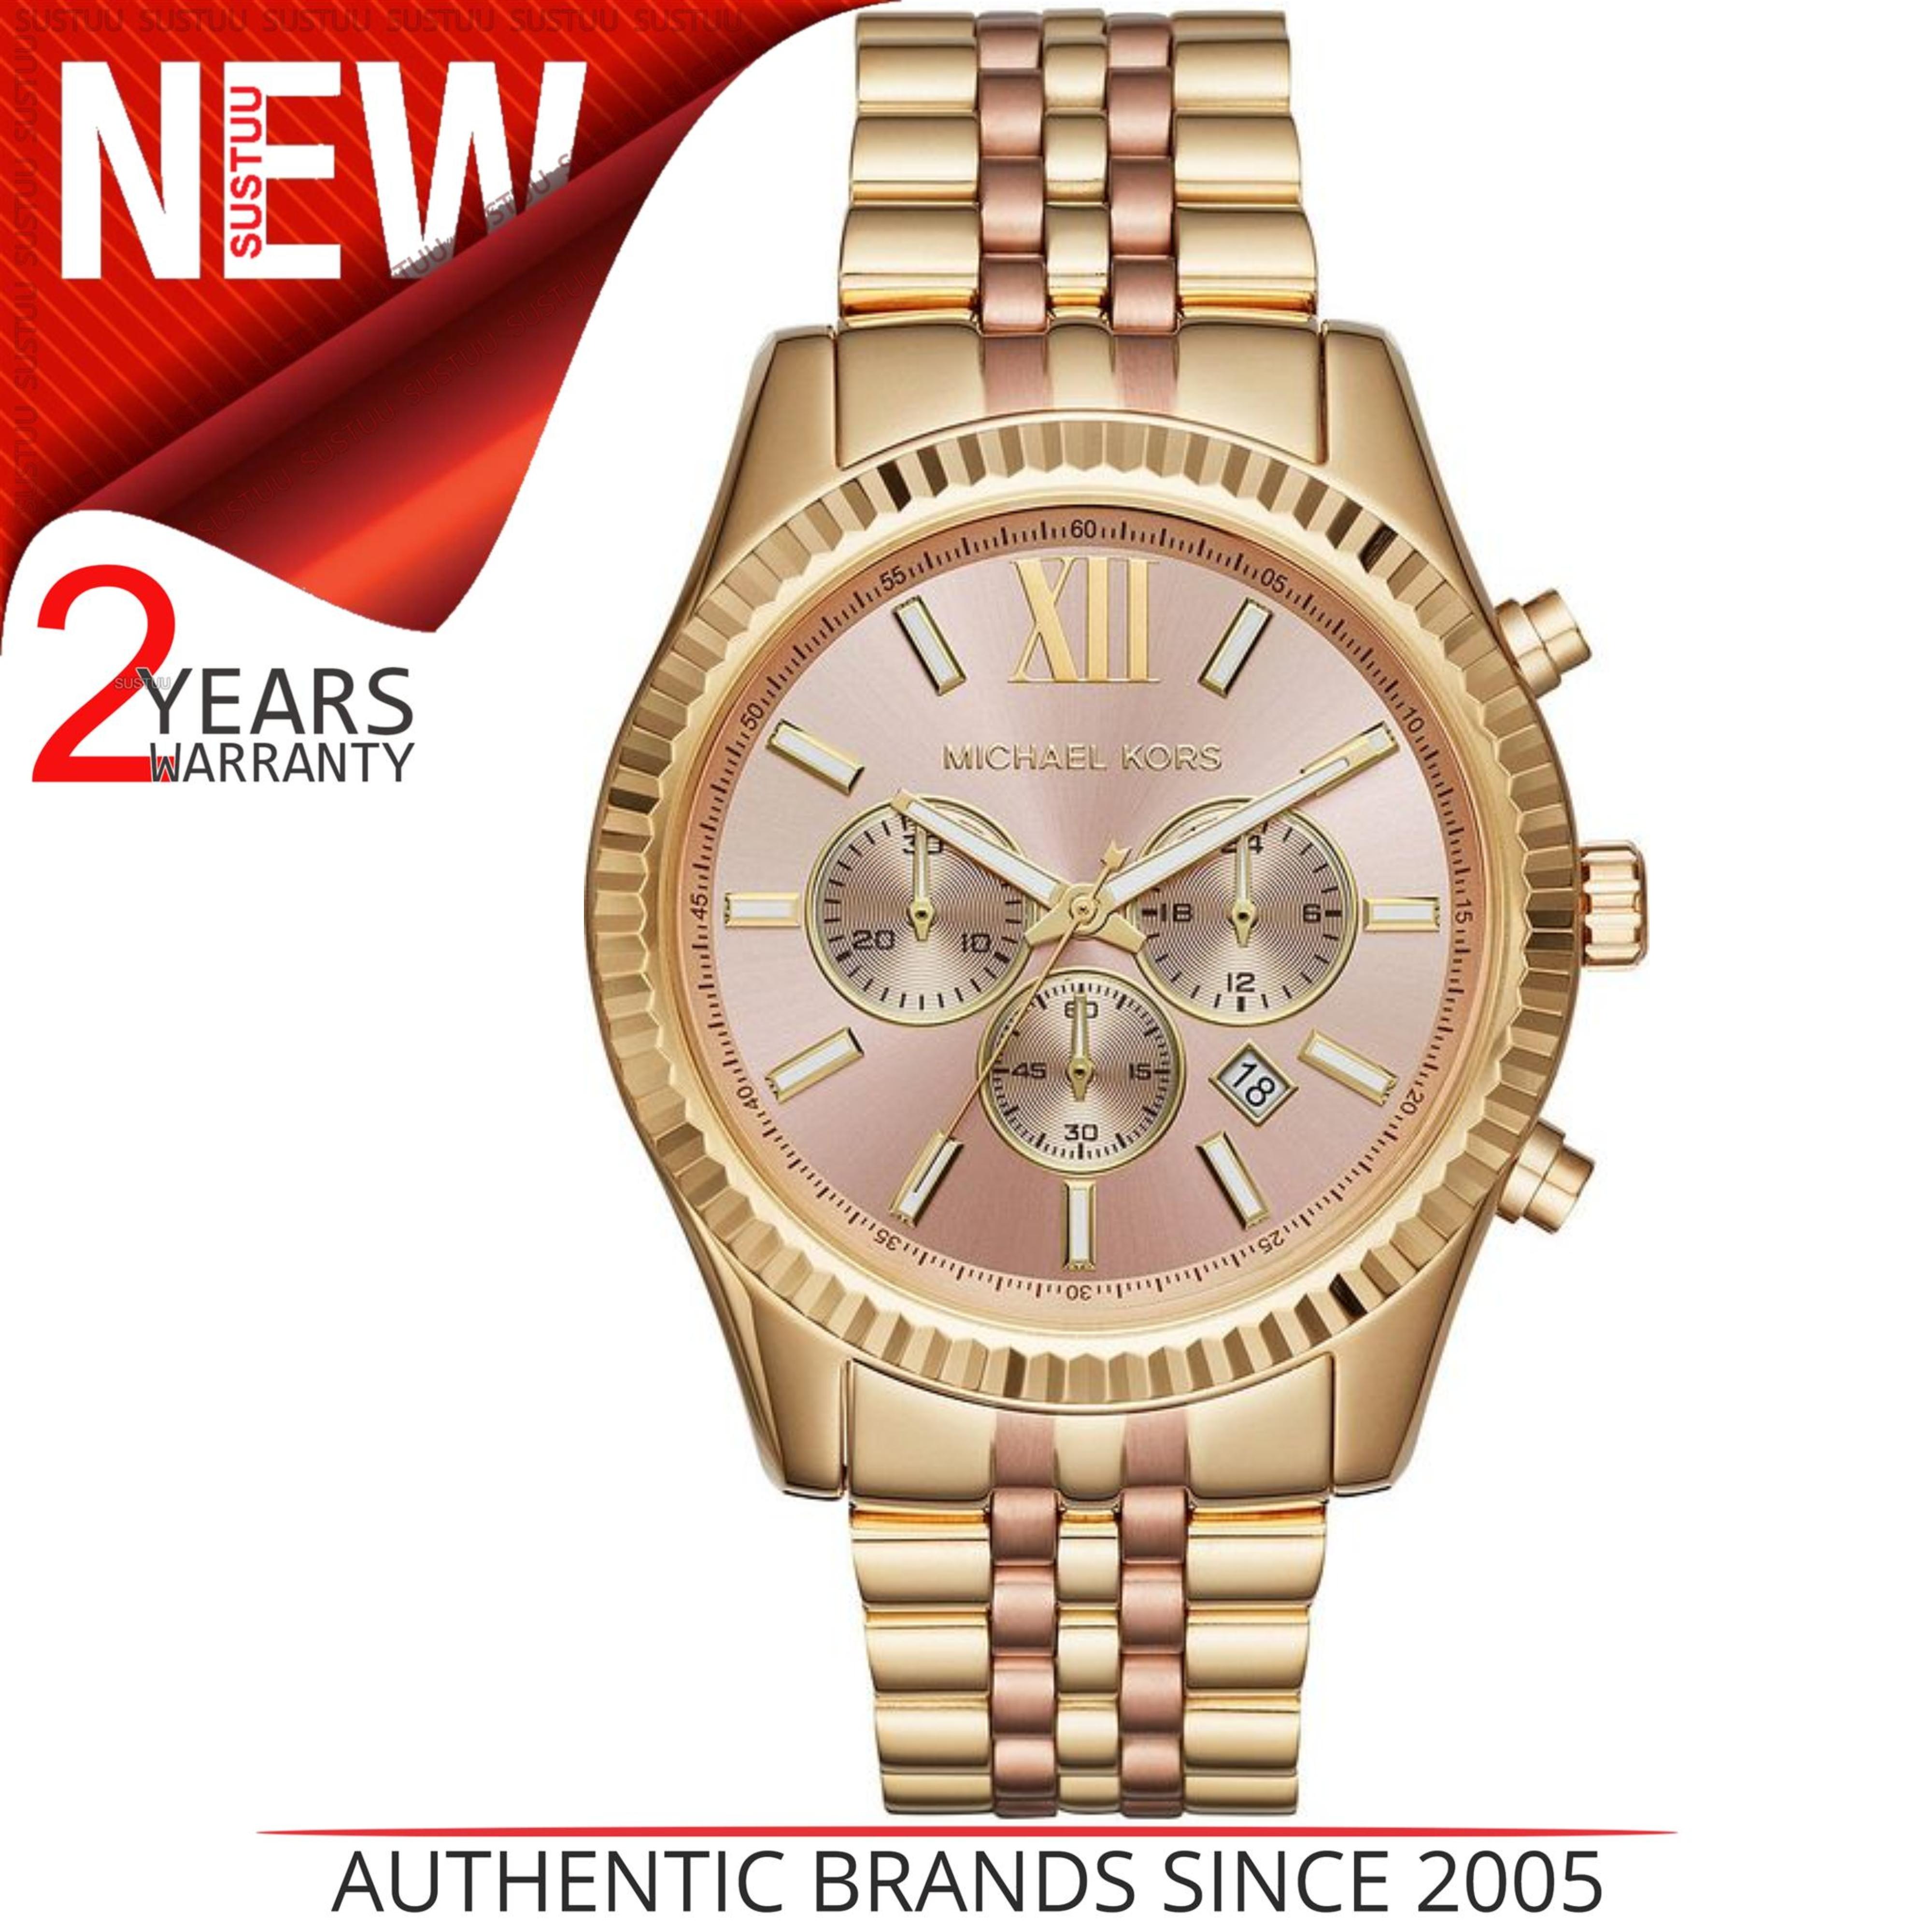 Details about Michael Kors Lexington Rose Gold Dial Ladies  Watch│Chronograph│Gold Strap│MK6473 1b1c61cb5f5